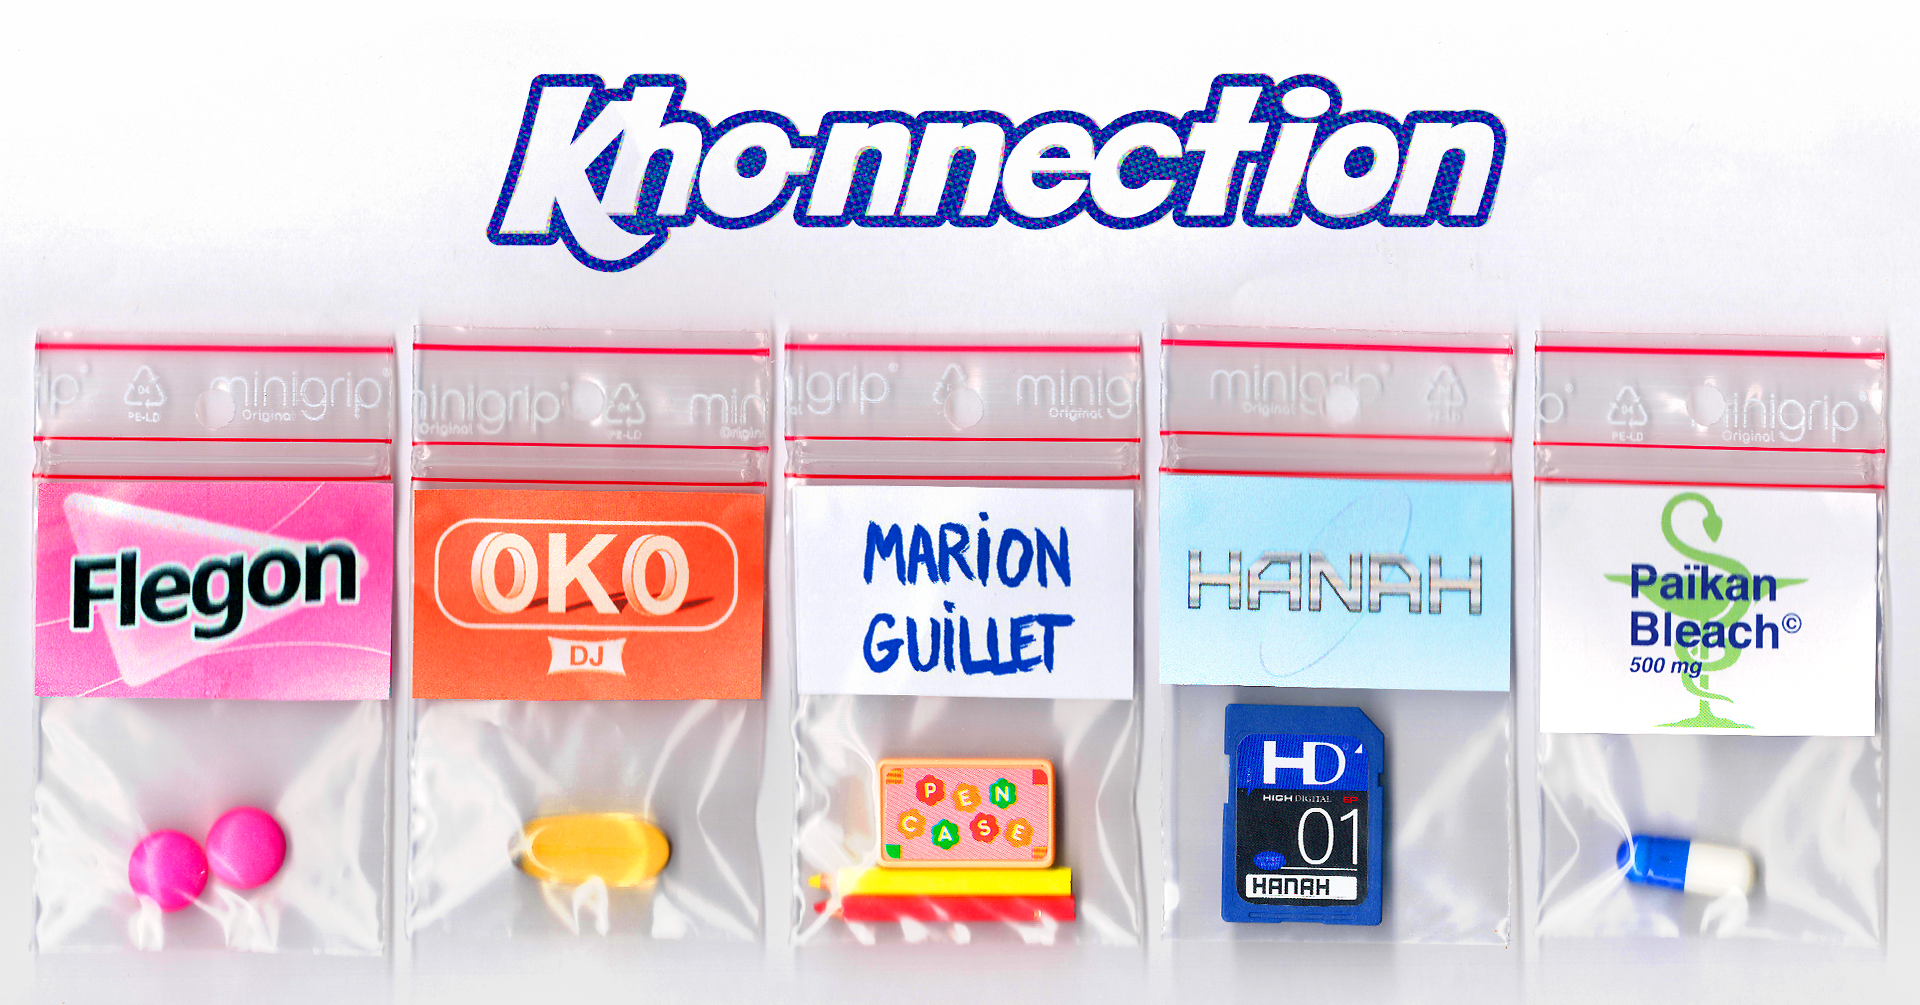 Kho-nnection #4 • OKO DJ, Flegon, Marion Guillet, Hanah